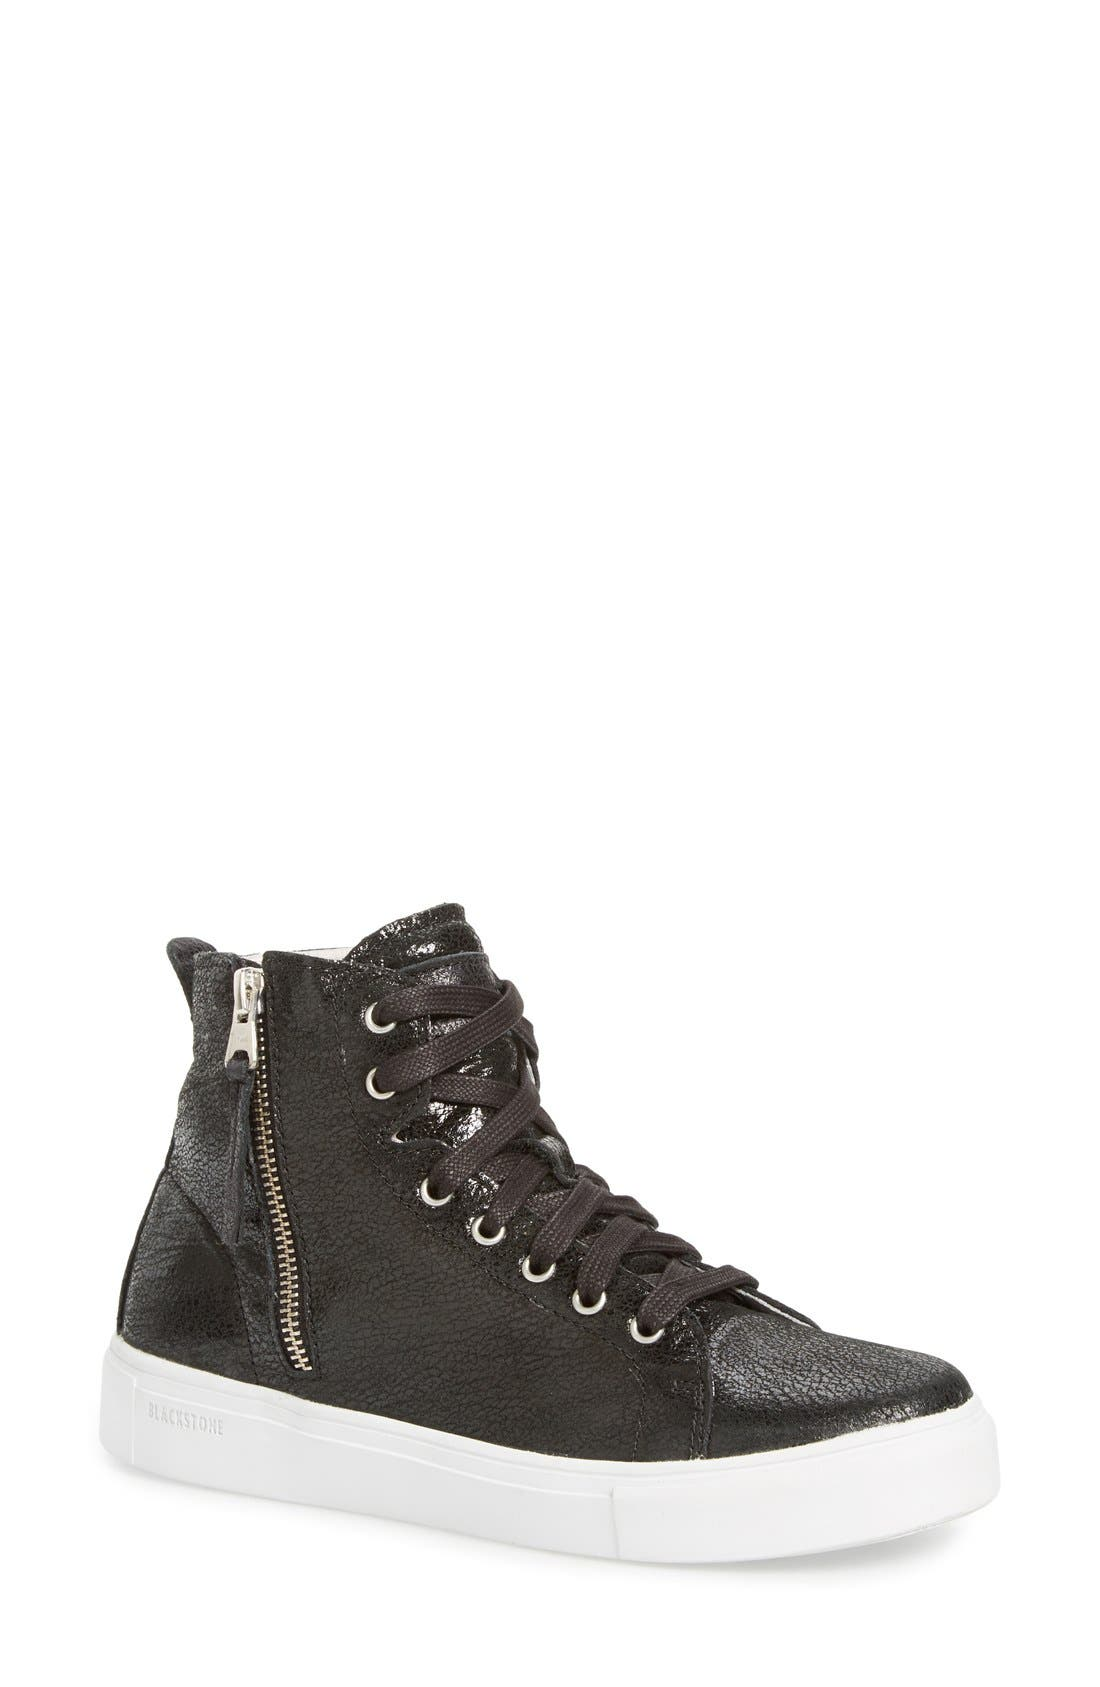 Main Image - Blackstone 'LL65' High Top Sneaker (Women)